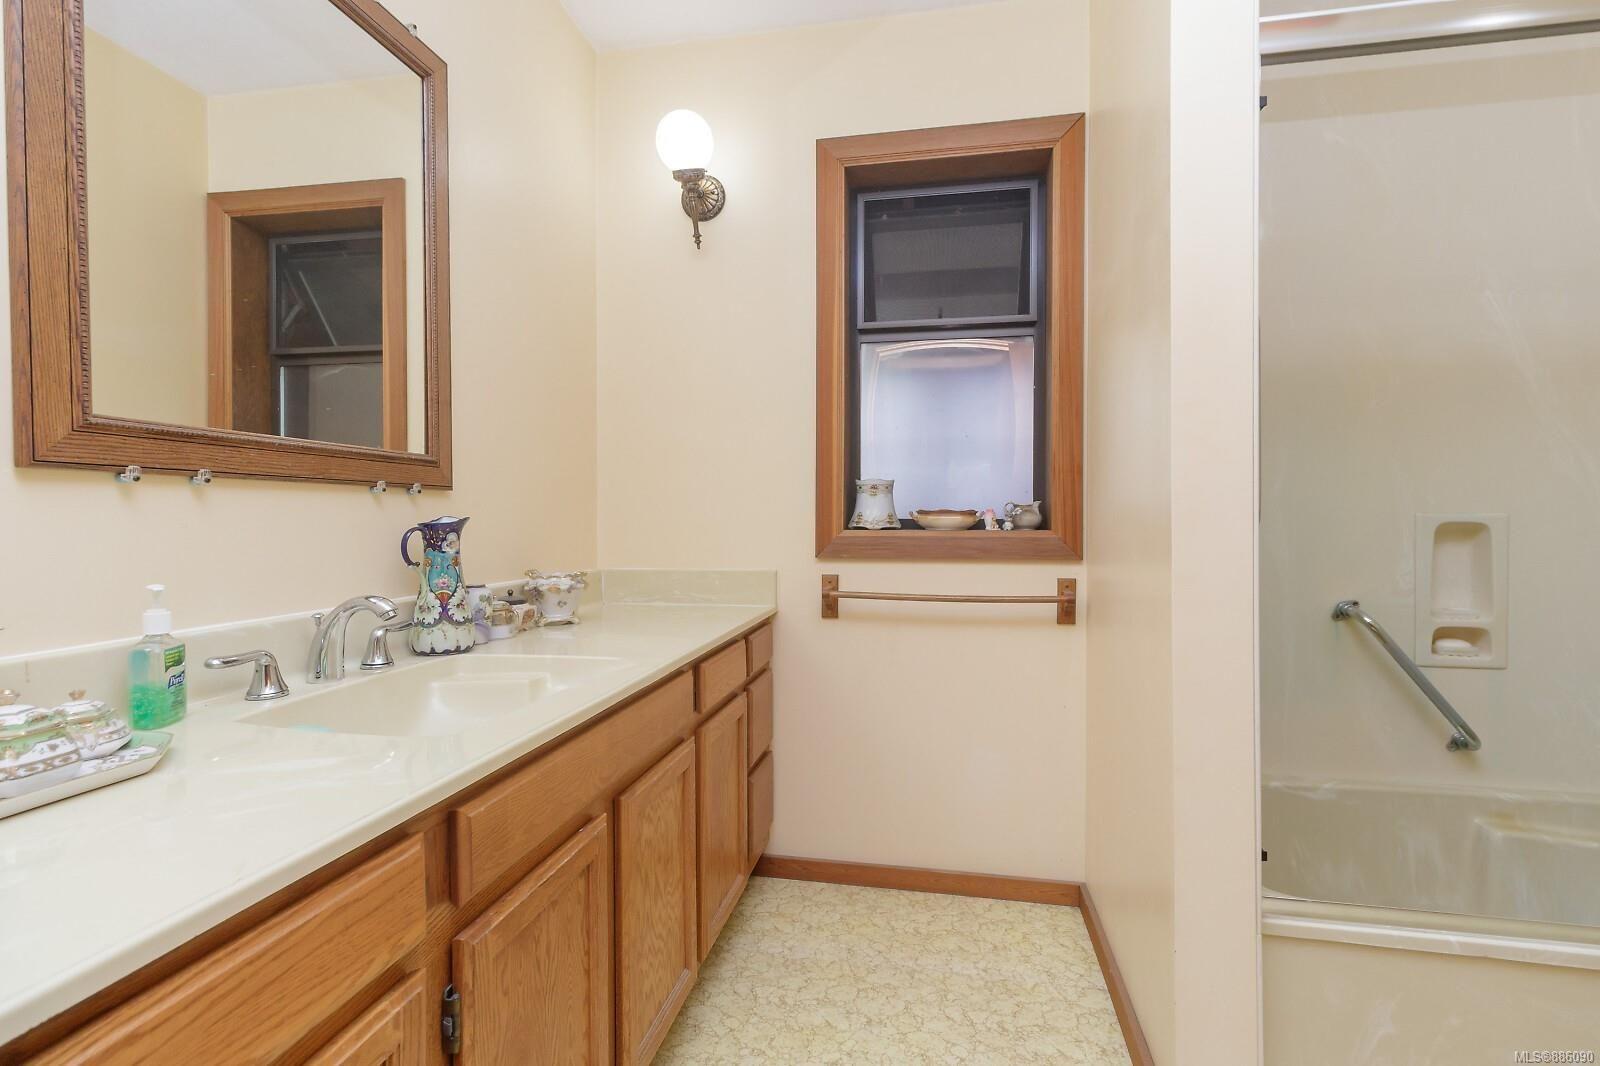 Photo 21: Photos: 4553 Blenkinsop Rd in : SE Blenkinsop House for sale (Saanich East)  : MLS®# 886090